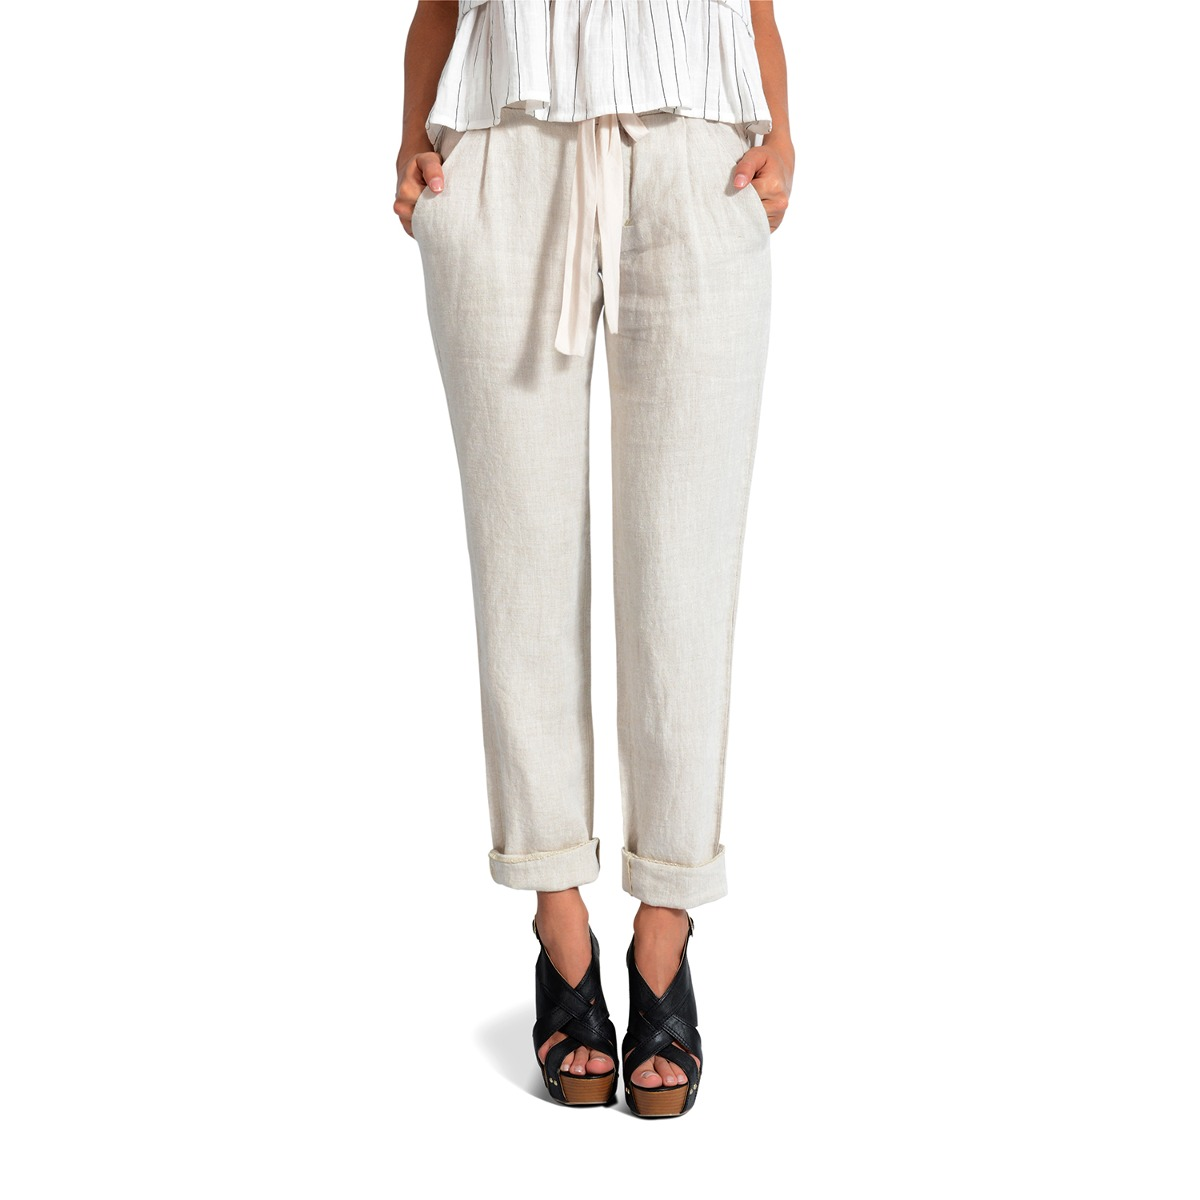 Pantalon Color Siete Para Mujer - Beige -   89.900 en Mercado Libre 257f875309d3